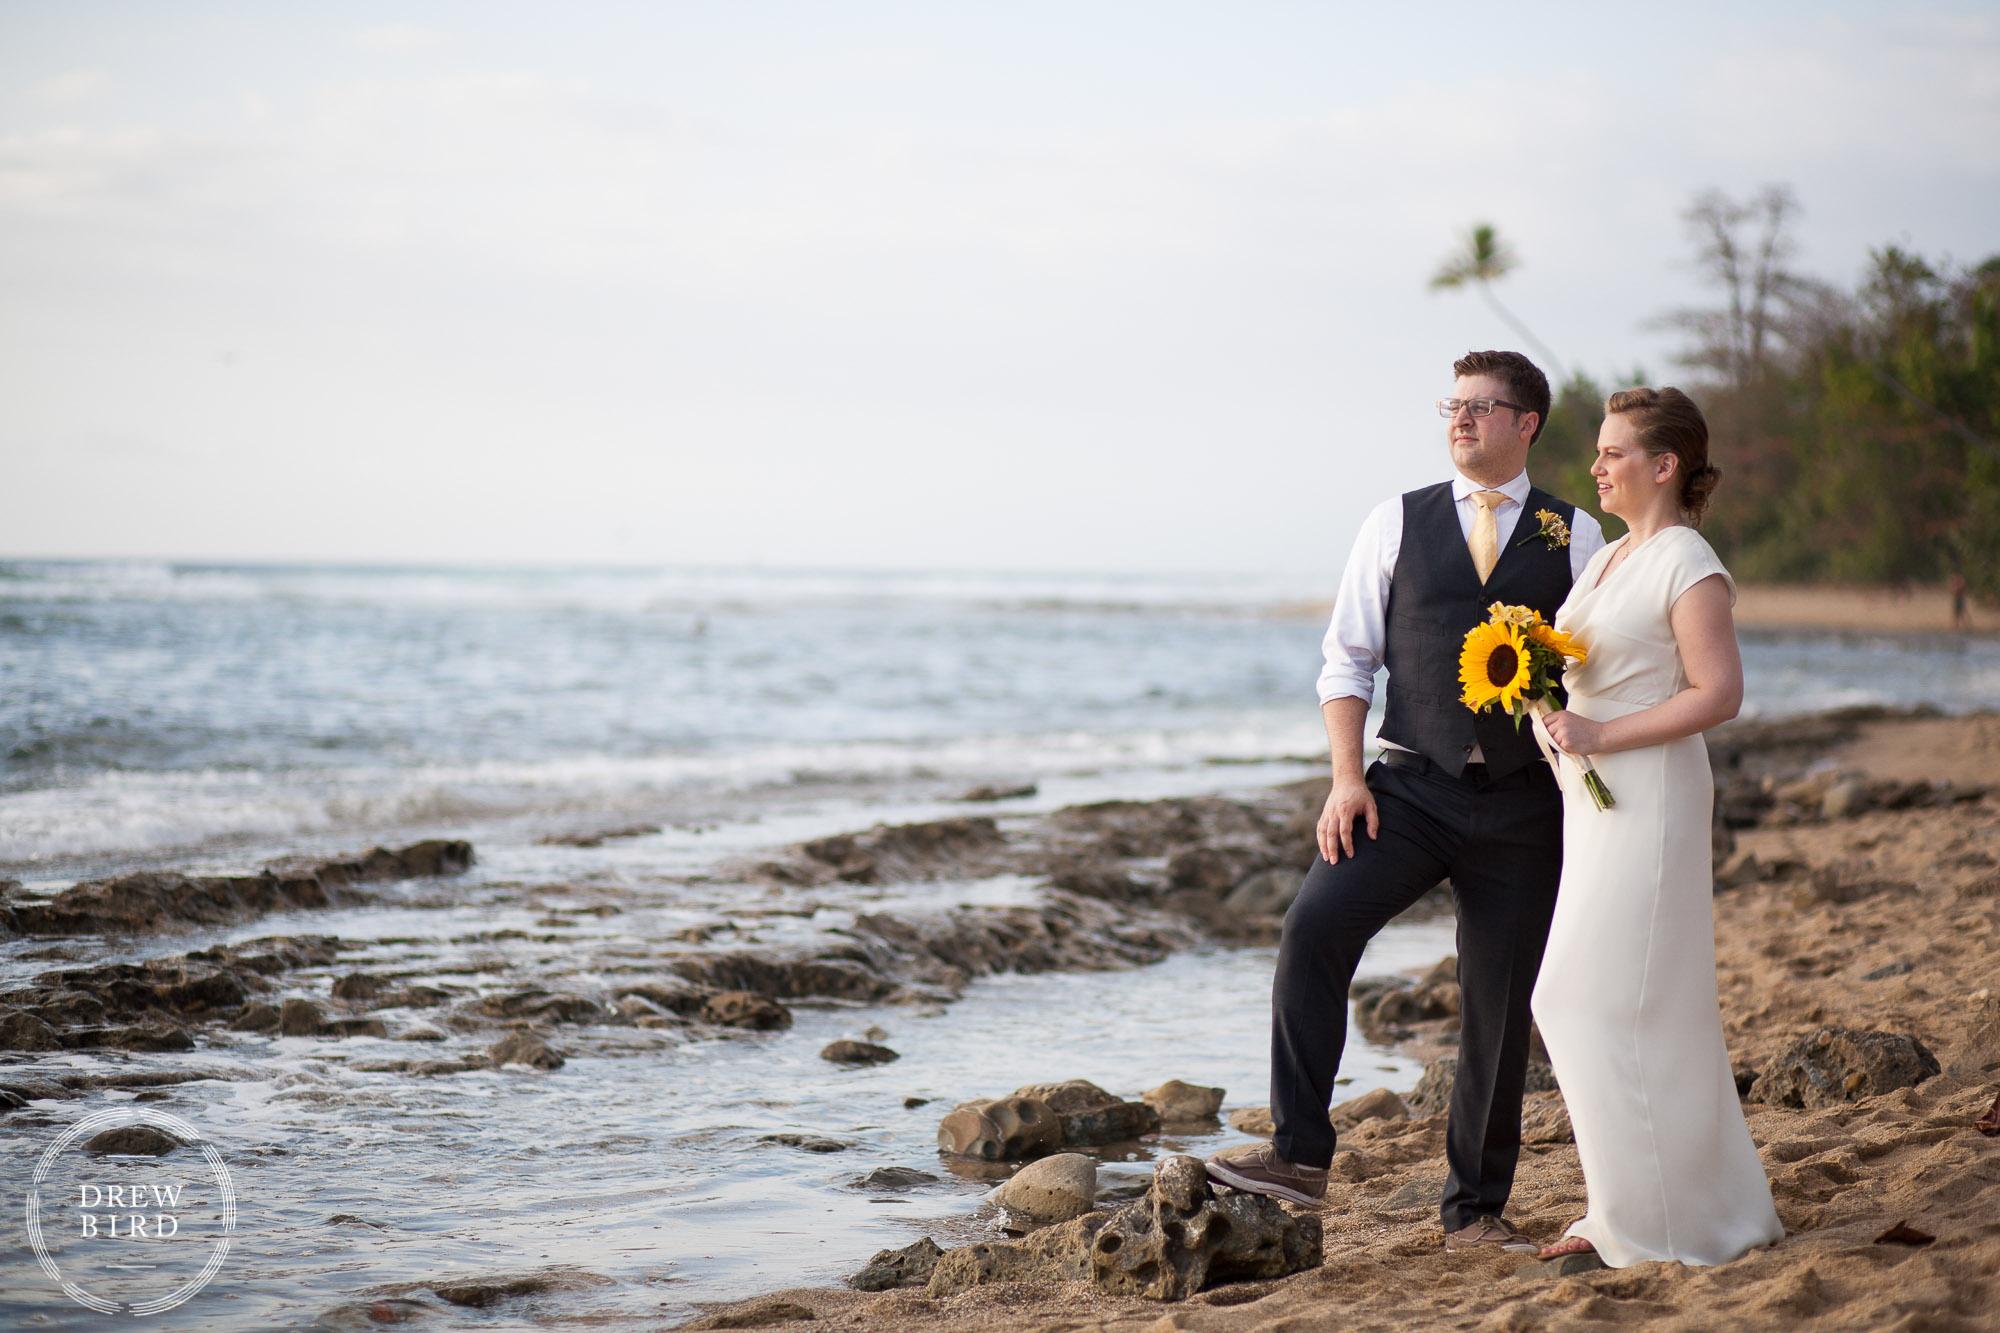 Bride and groom standing on the beach at ocean's edge. Creative portrait. Rincon Puerto Rico beach wedding. Destination wedding photographer Drew Bird. Villa Playa Maria wedding photography.